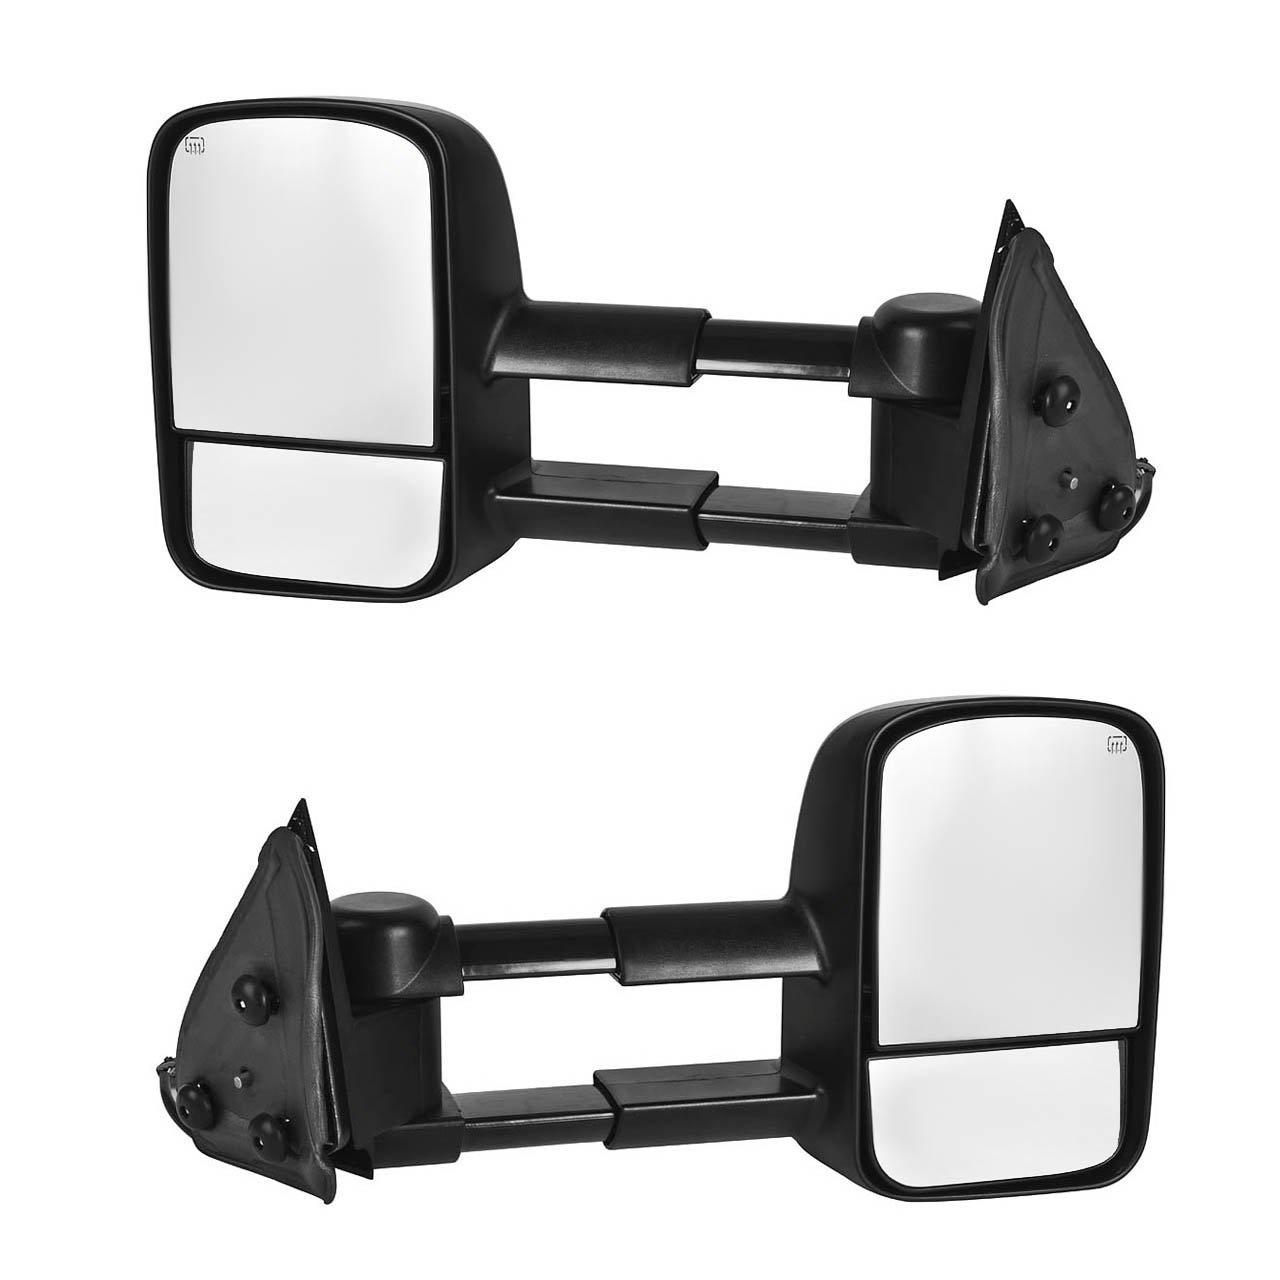 Dedc Towing Mirrors Fit For 1999 2002 Chevy Silverado 2000 3500 Trailer Ke Controller Wiring 1500 2500 Gmc Sierra Yukon Power Heated Manual Telescoping Automotive